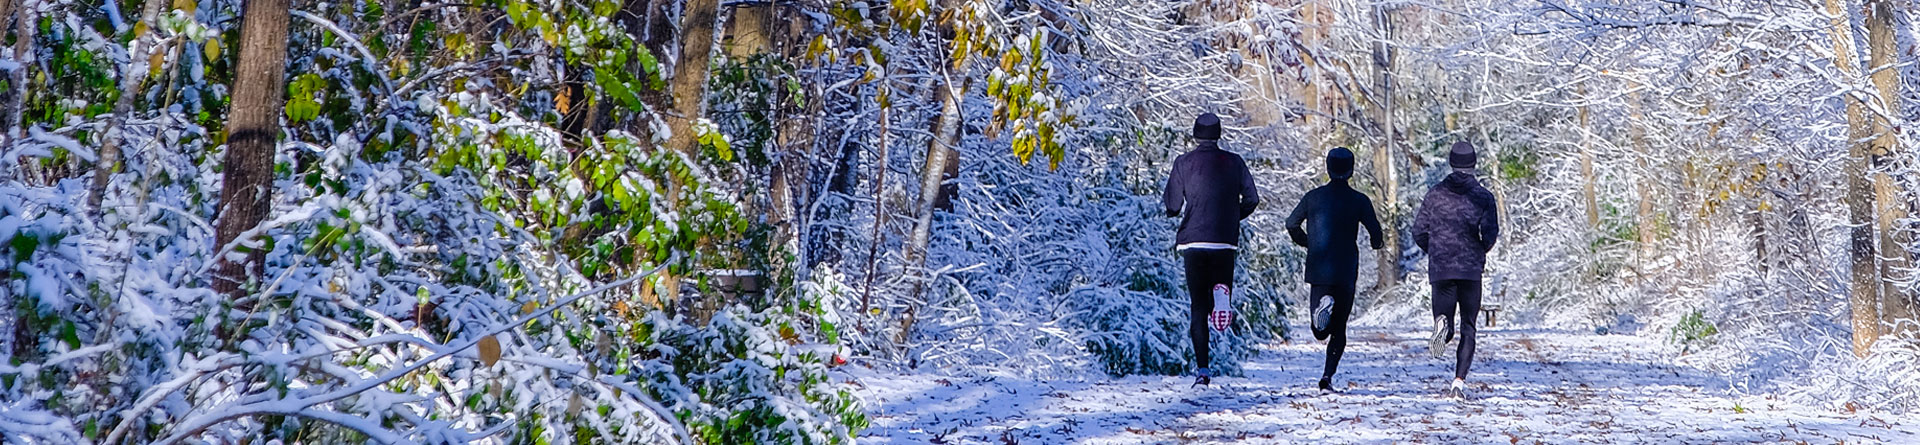 Men jogging along snowy path on a trail